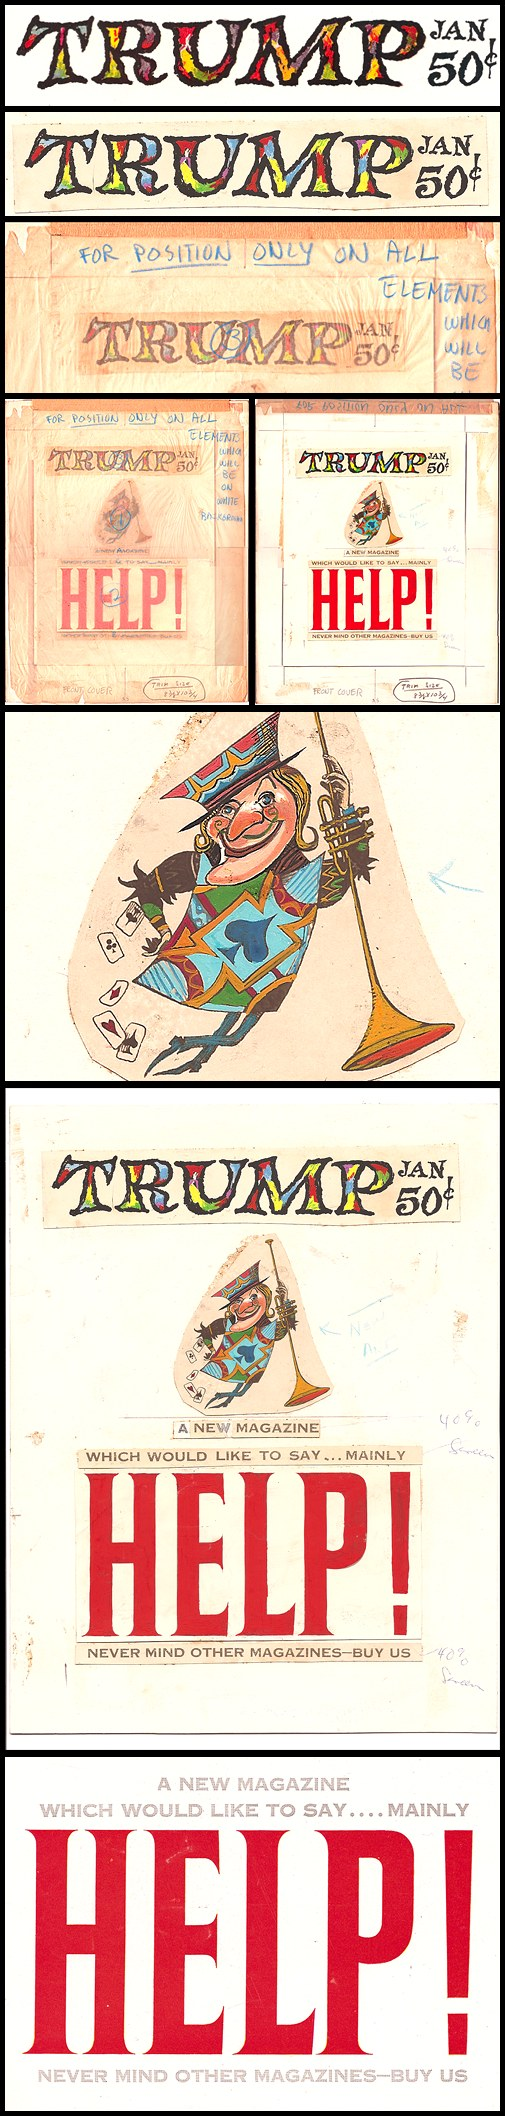 09. Trump #1 Cover Art, Pt. 1 (Jan 1957)